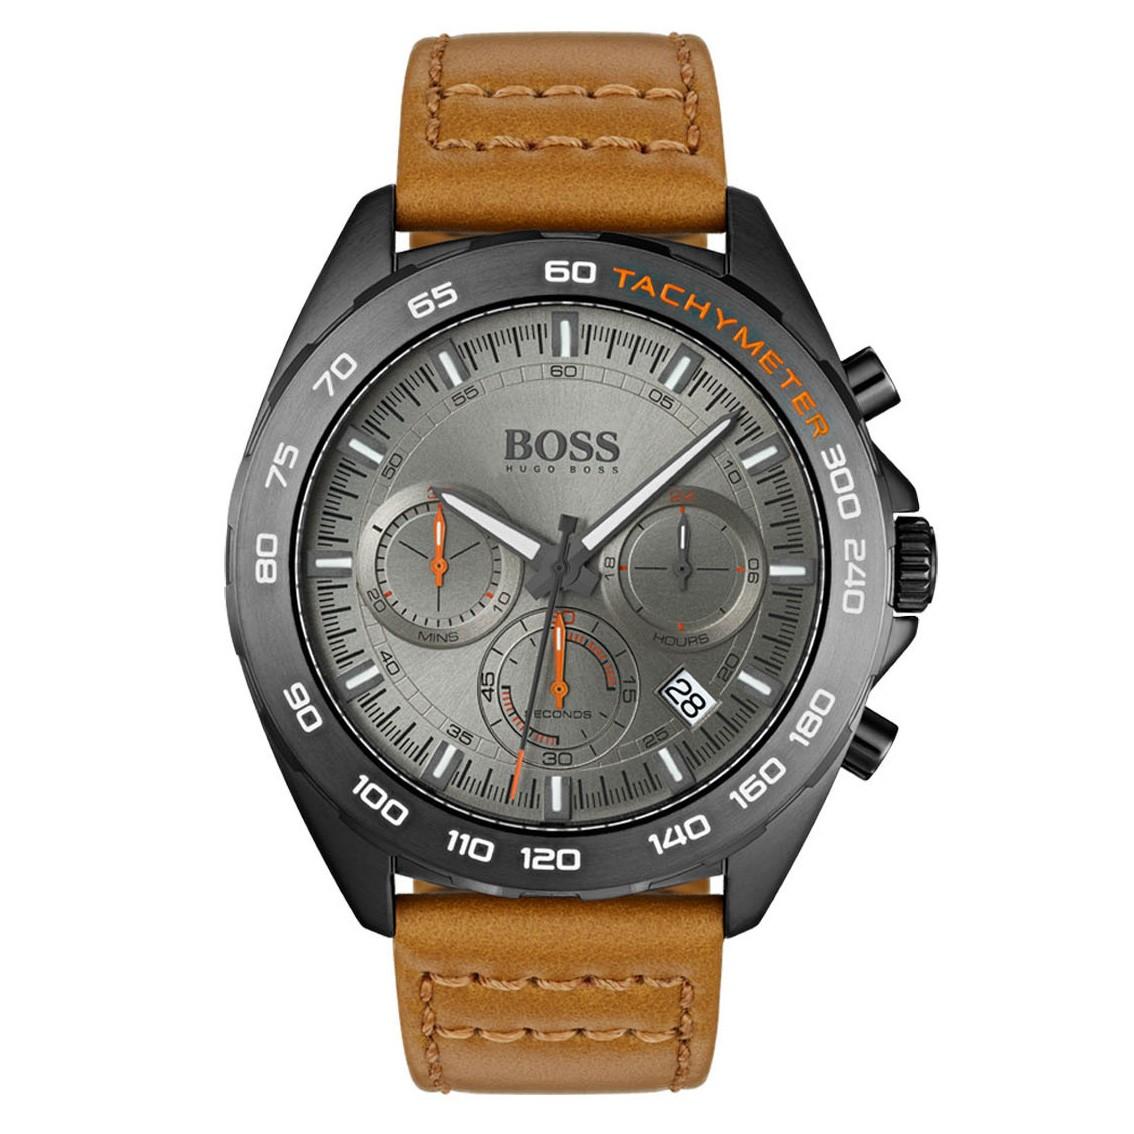 Hugo Boss HB1513664 Horloge Intensity chrono grijs-cognac 44 mm